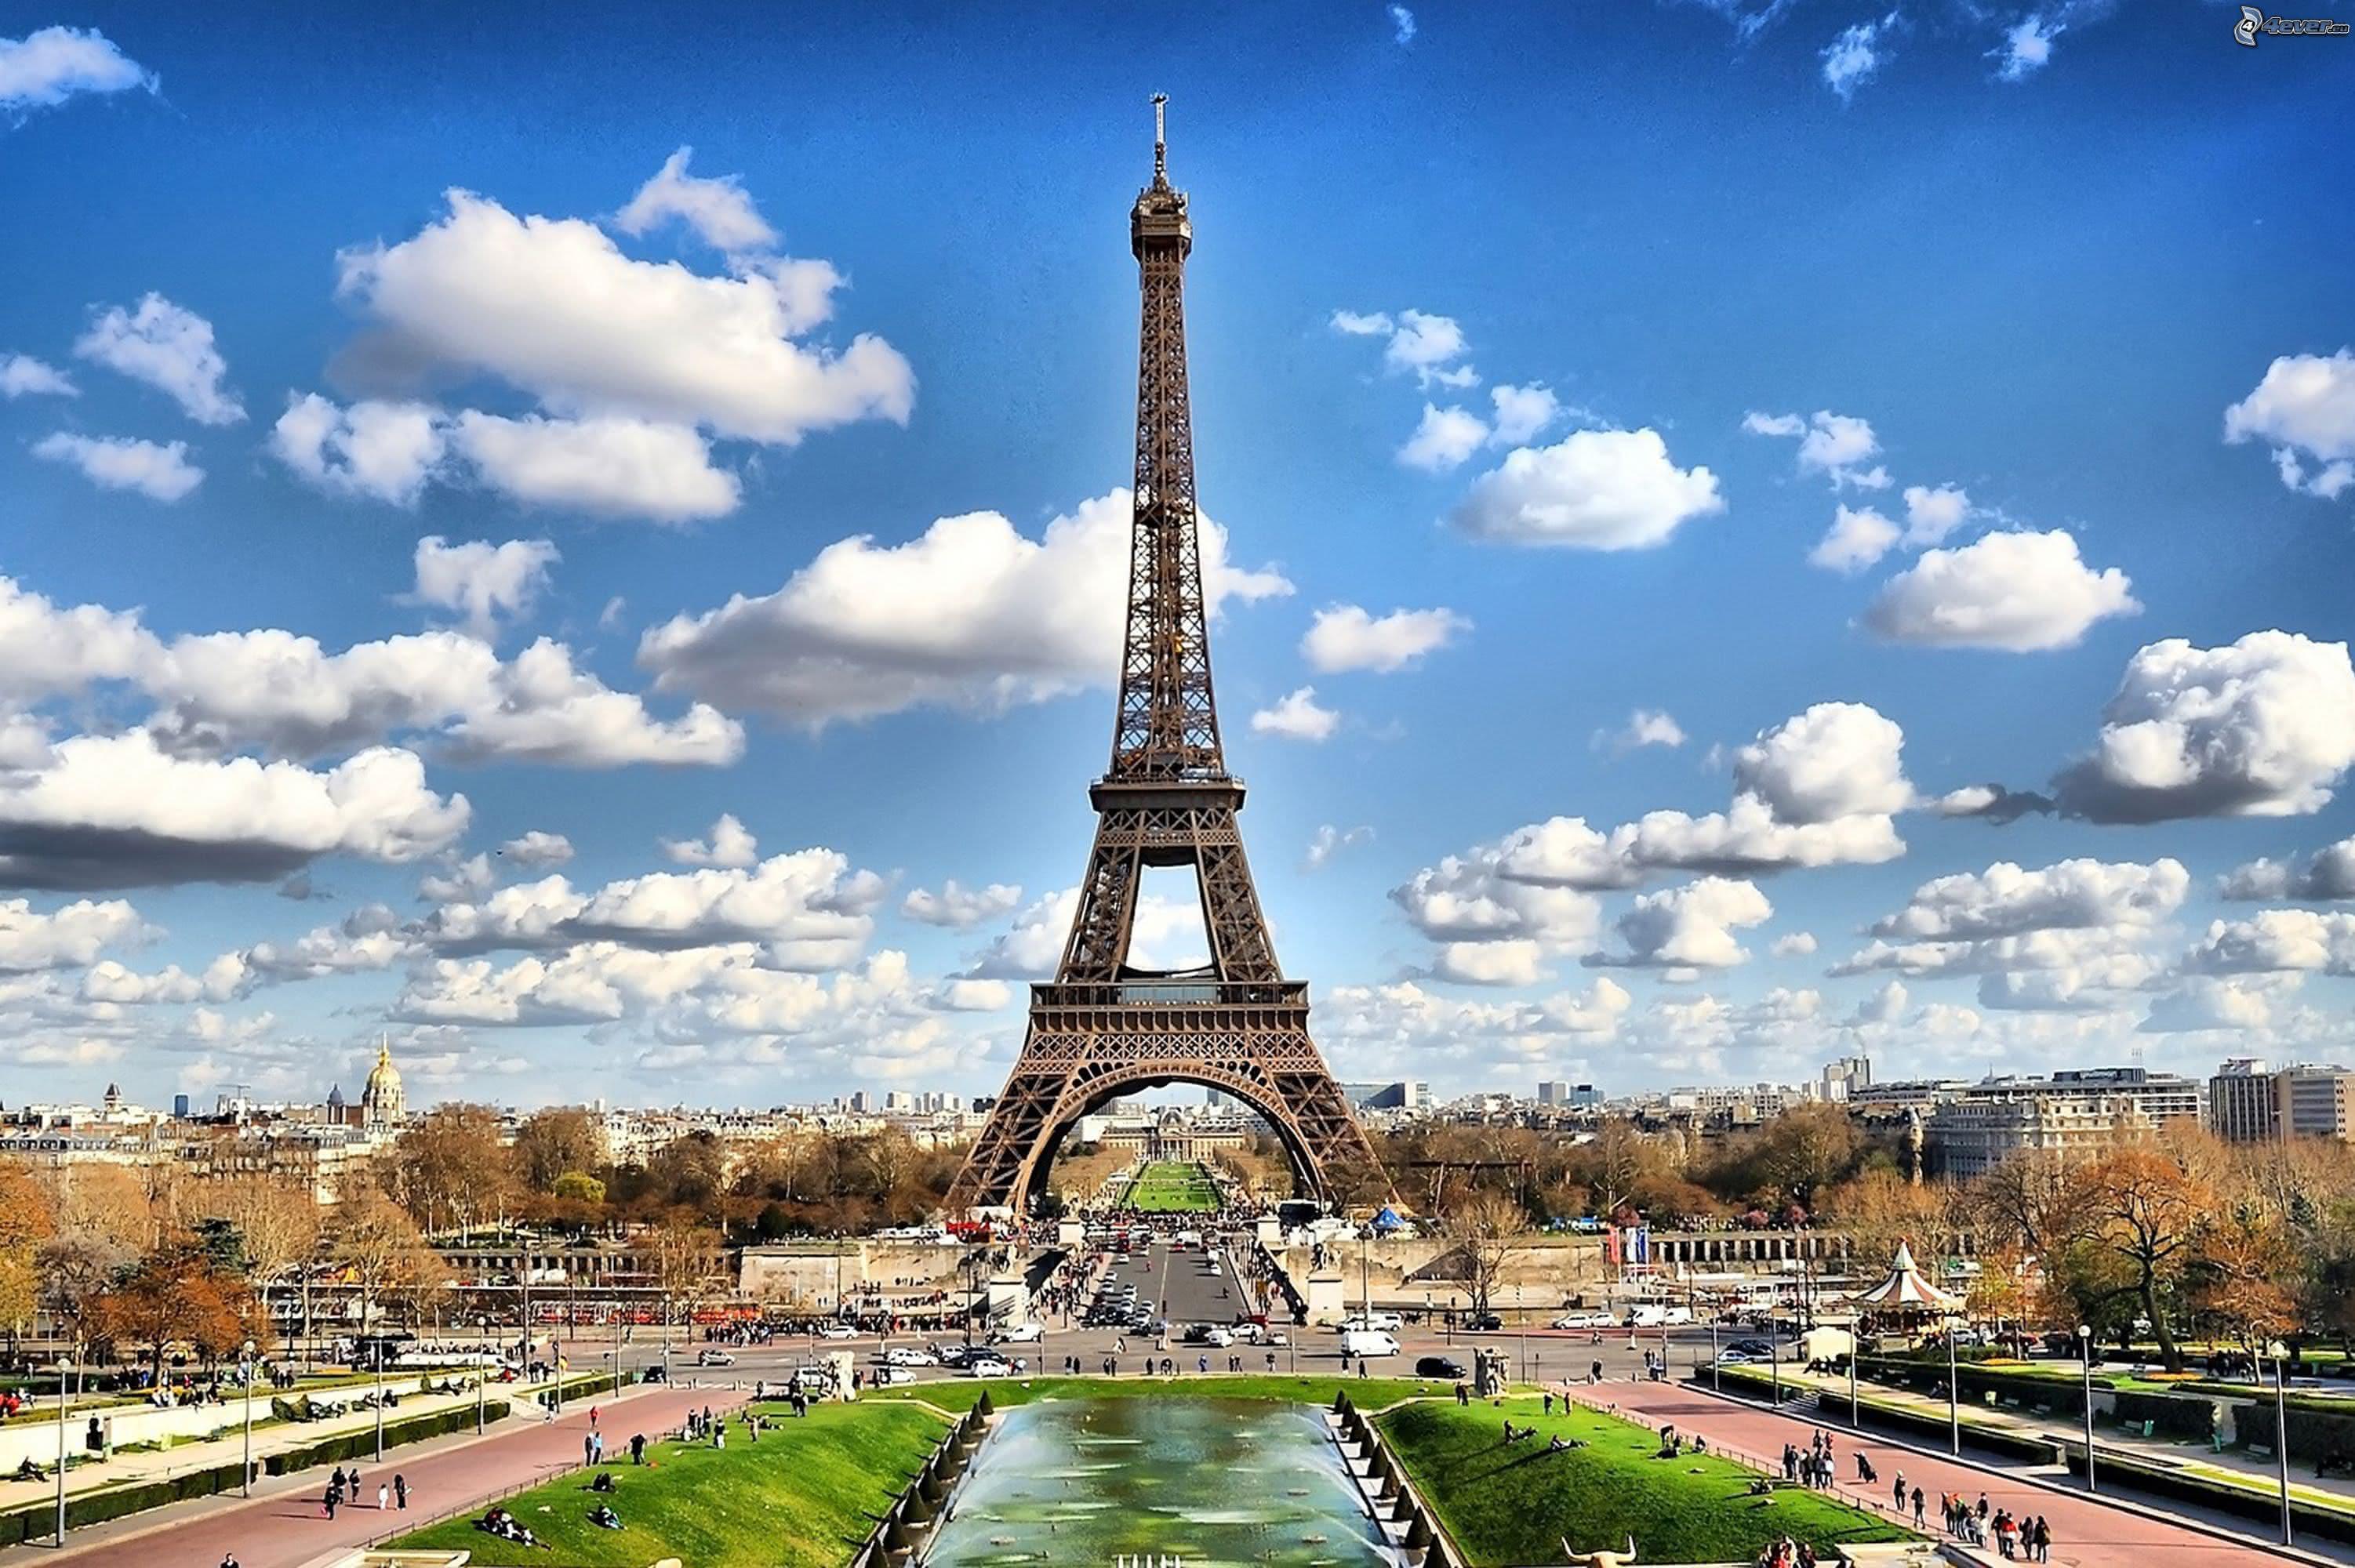 SIXT begrüßt Sie in Paris